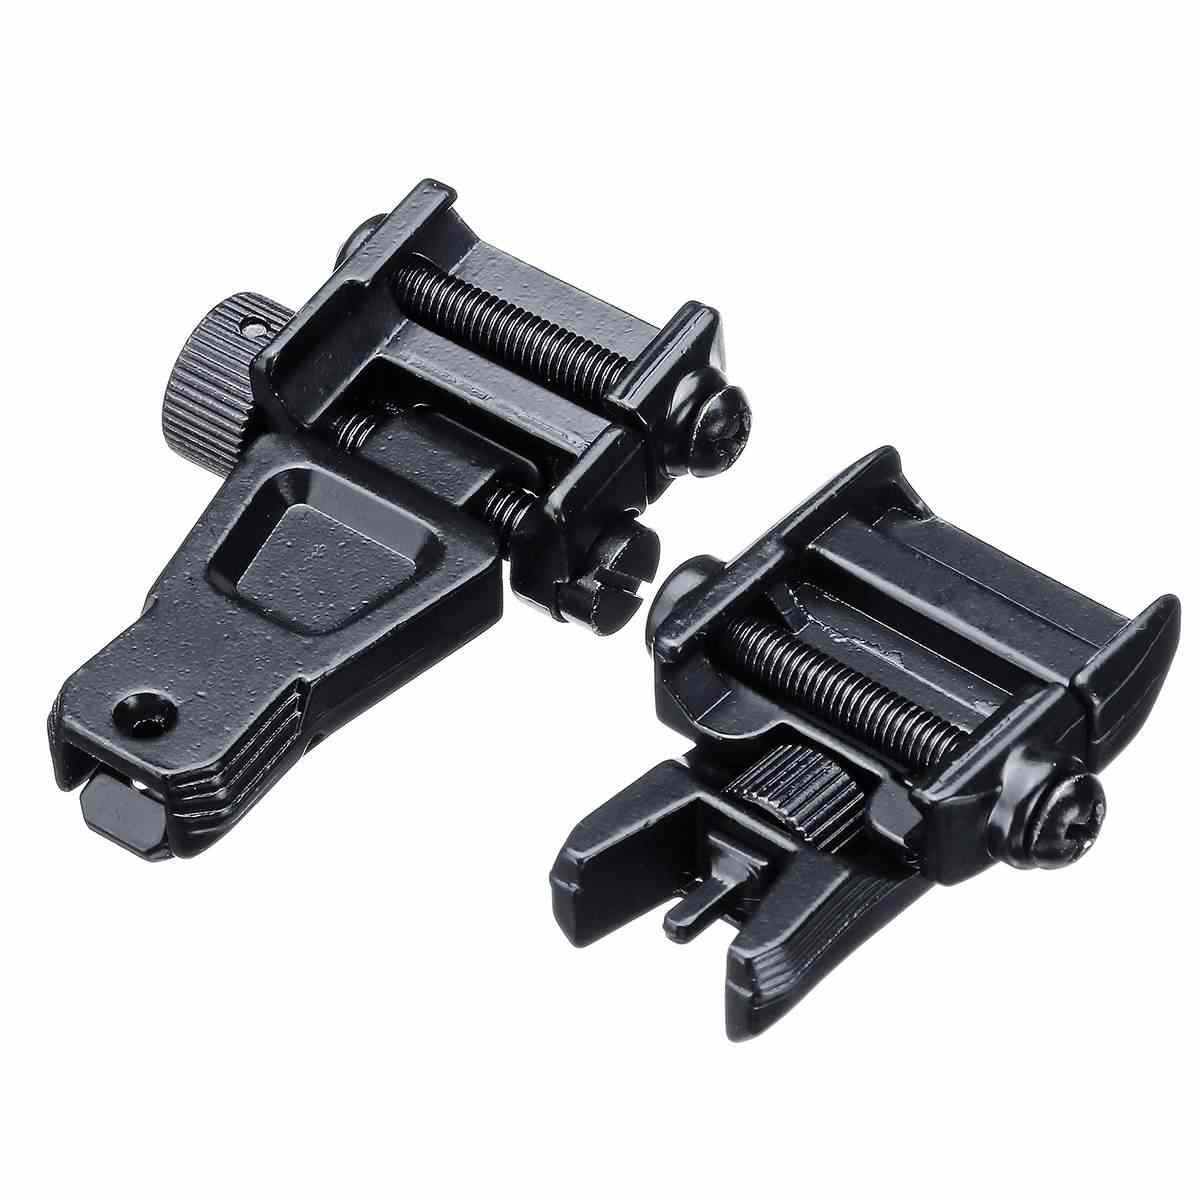 2pcs Flip up Front & Rear Iron Sight Set for Jinming Gen9 Gen8 M4 SCAR  Metal Diamond Aperture Toy Gu ns Iron Sights Set